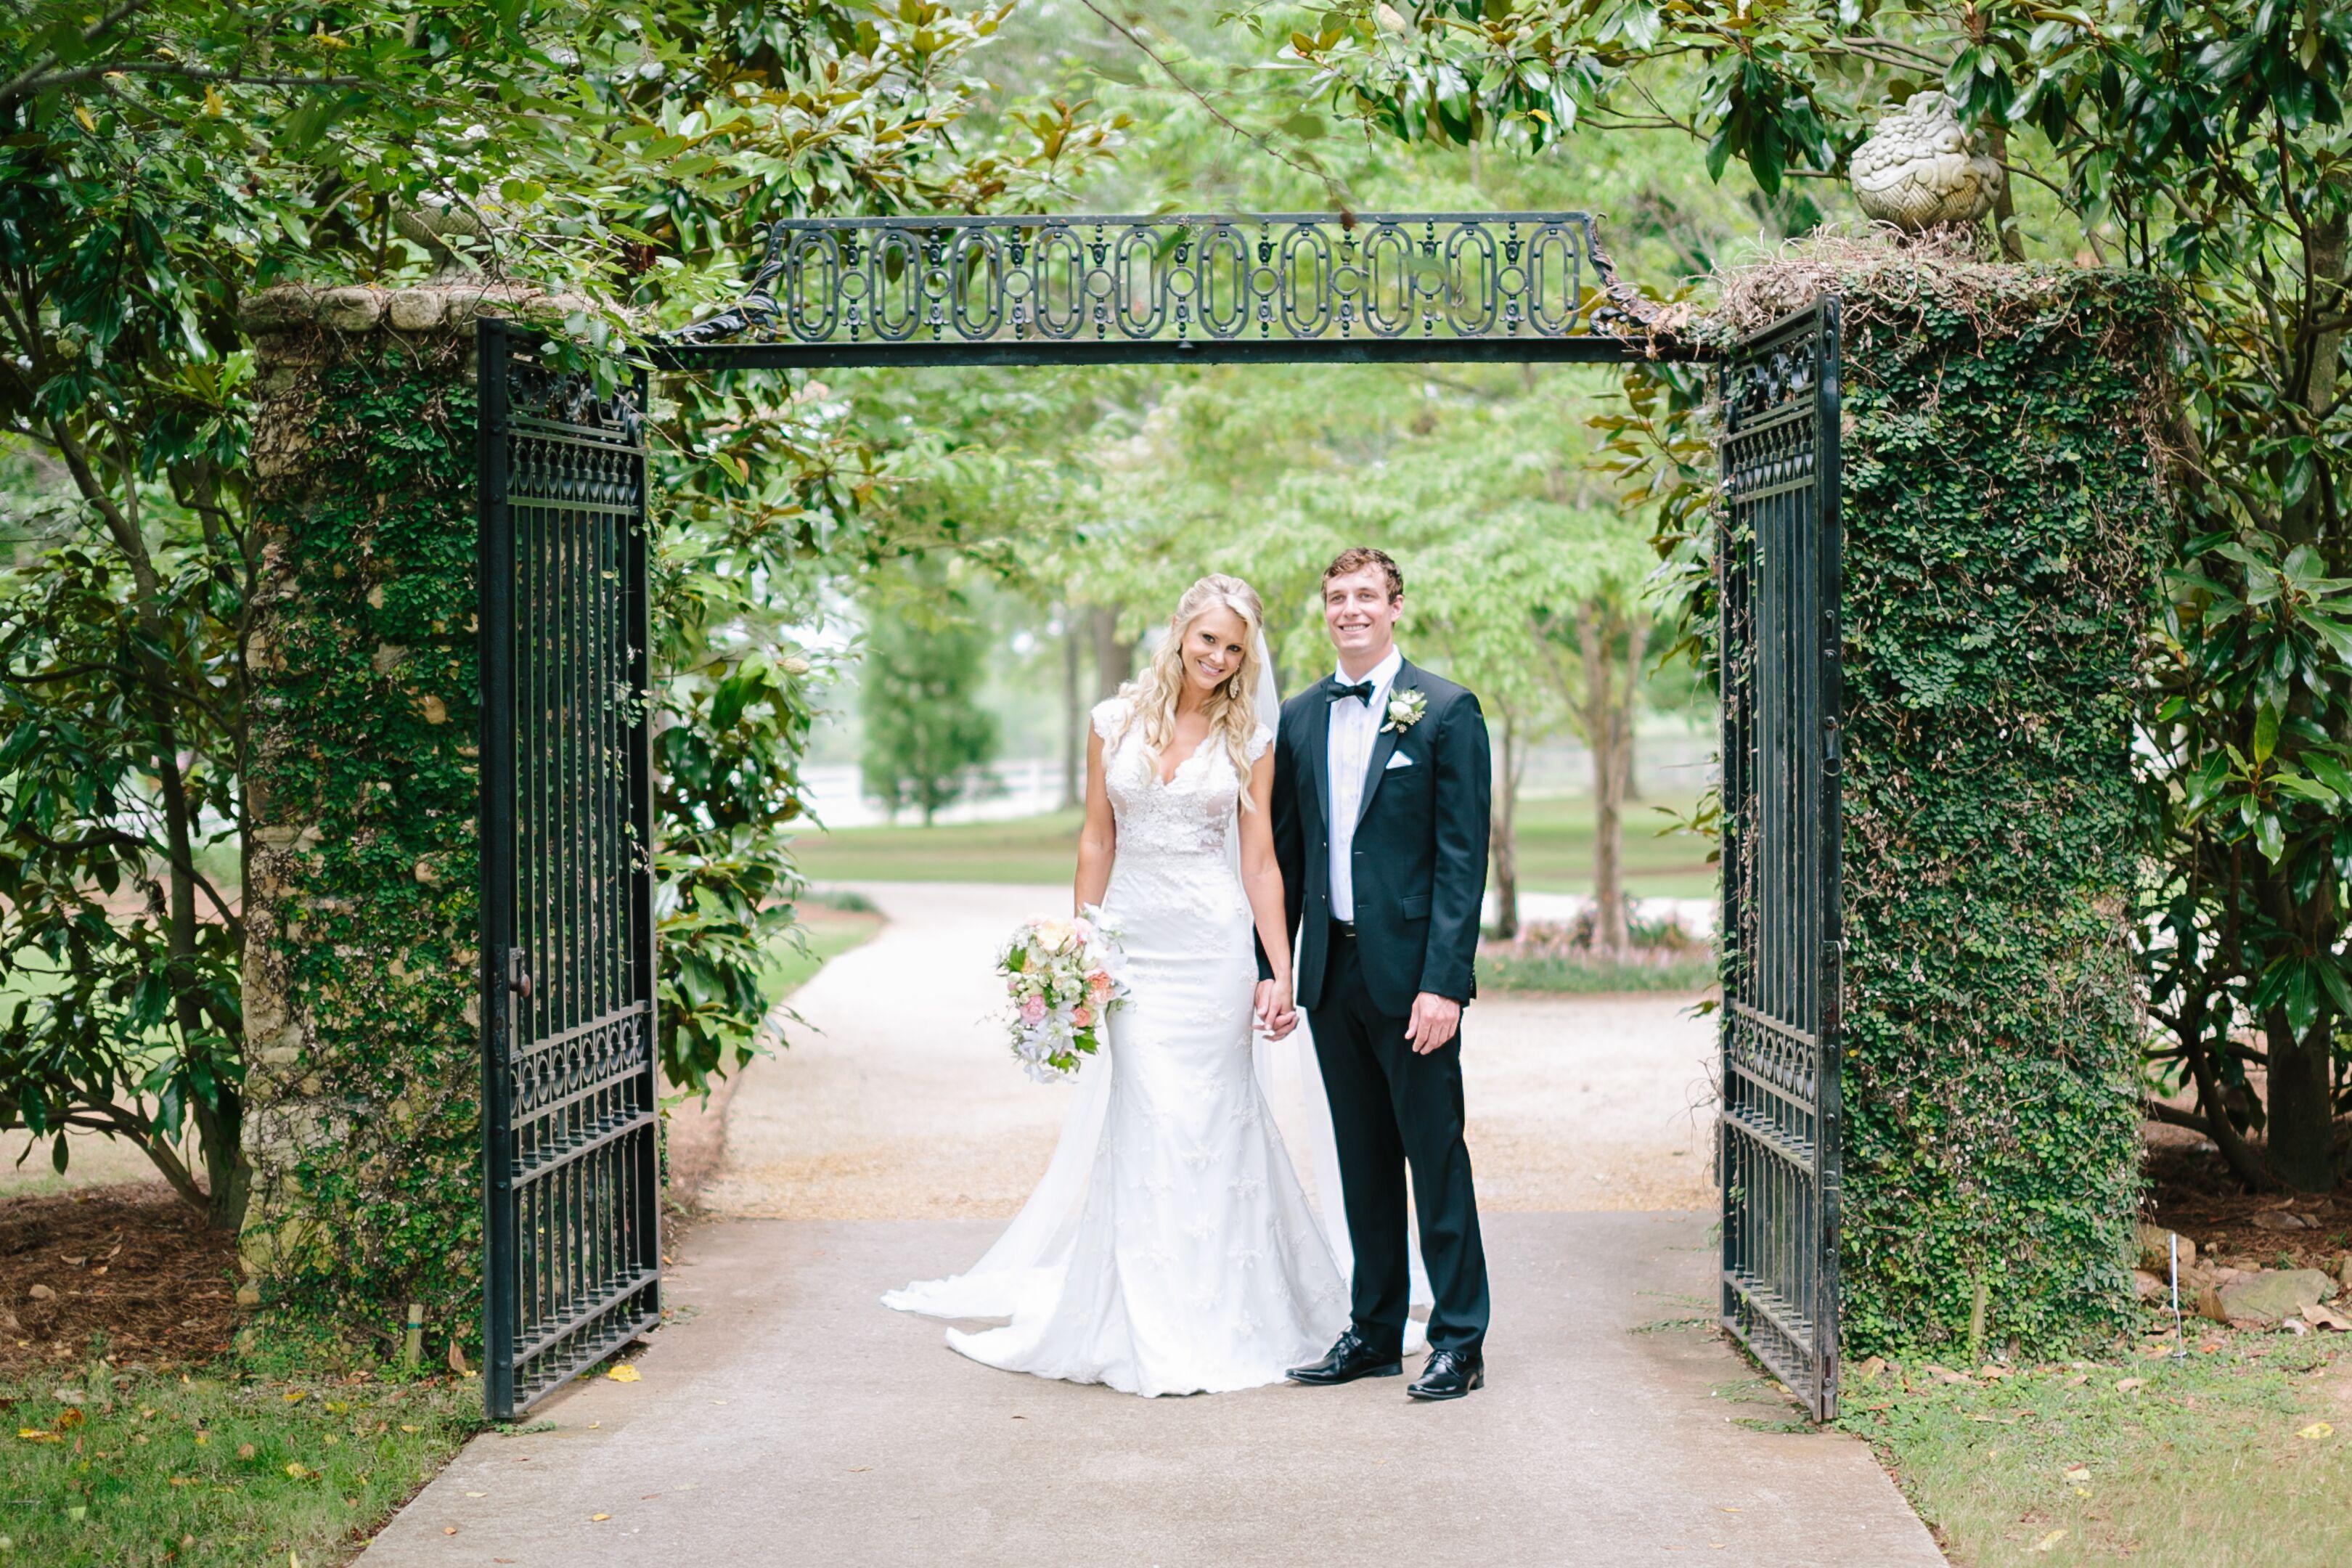 A Regal Tented Wedding at Serenata Farm in Madison, Georgia